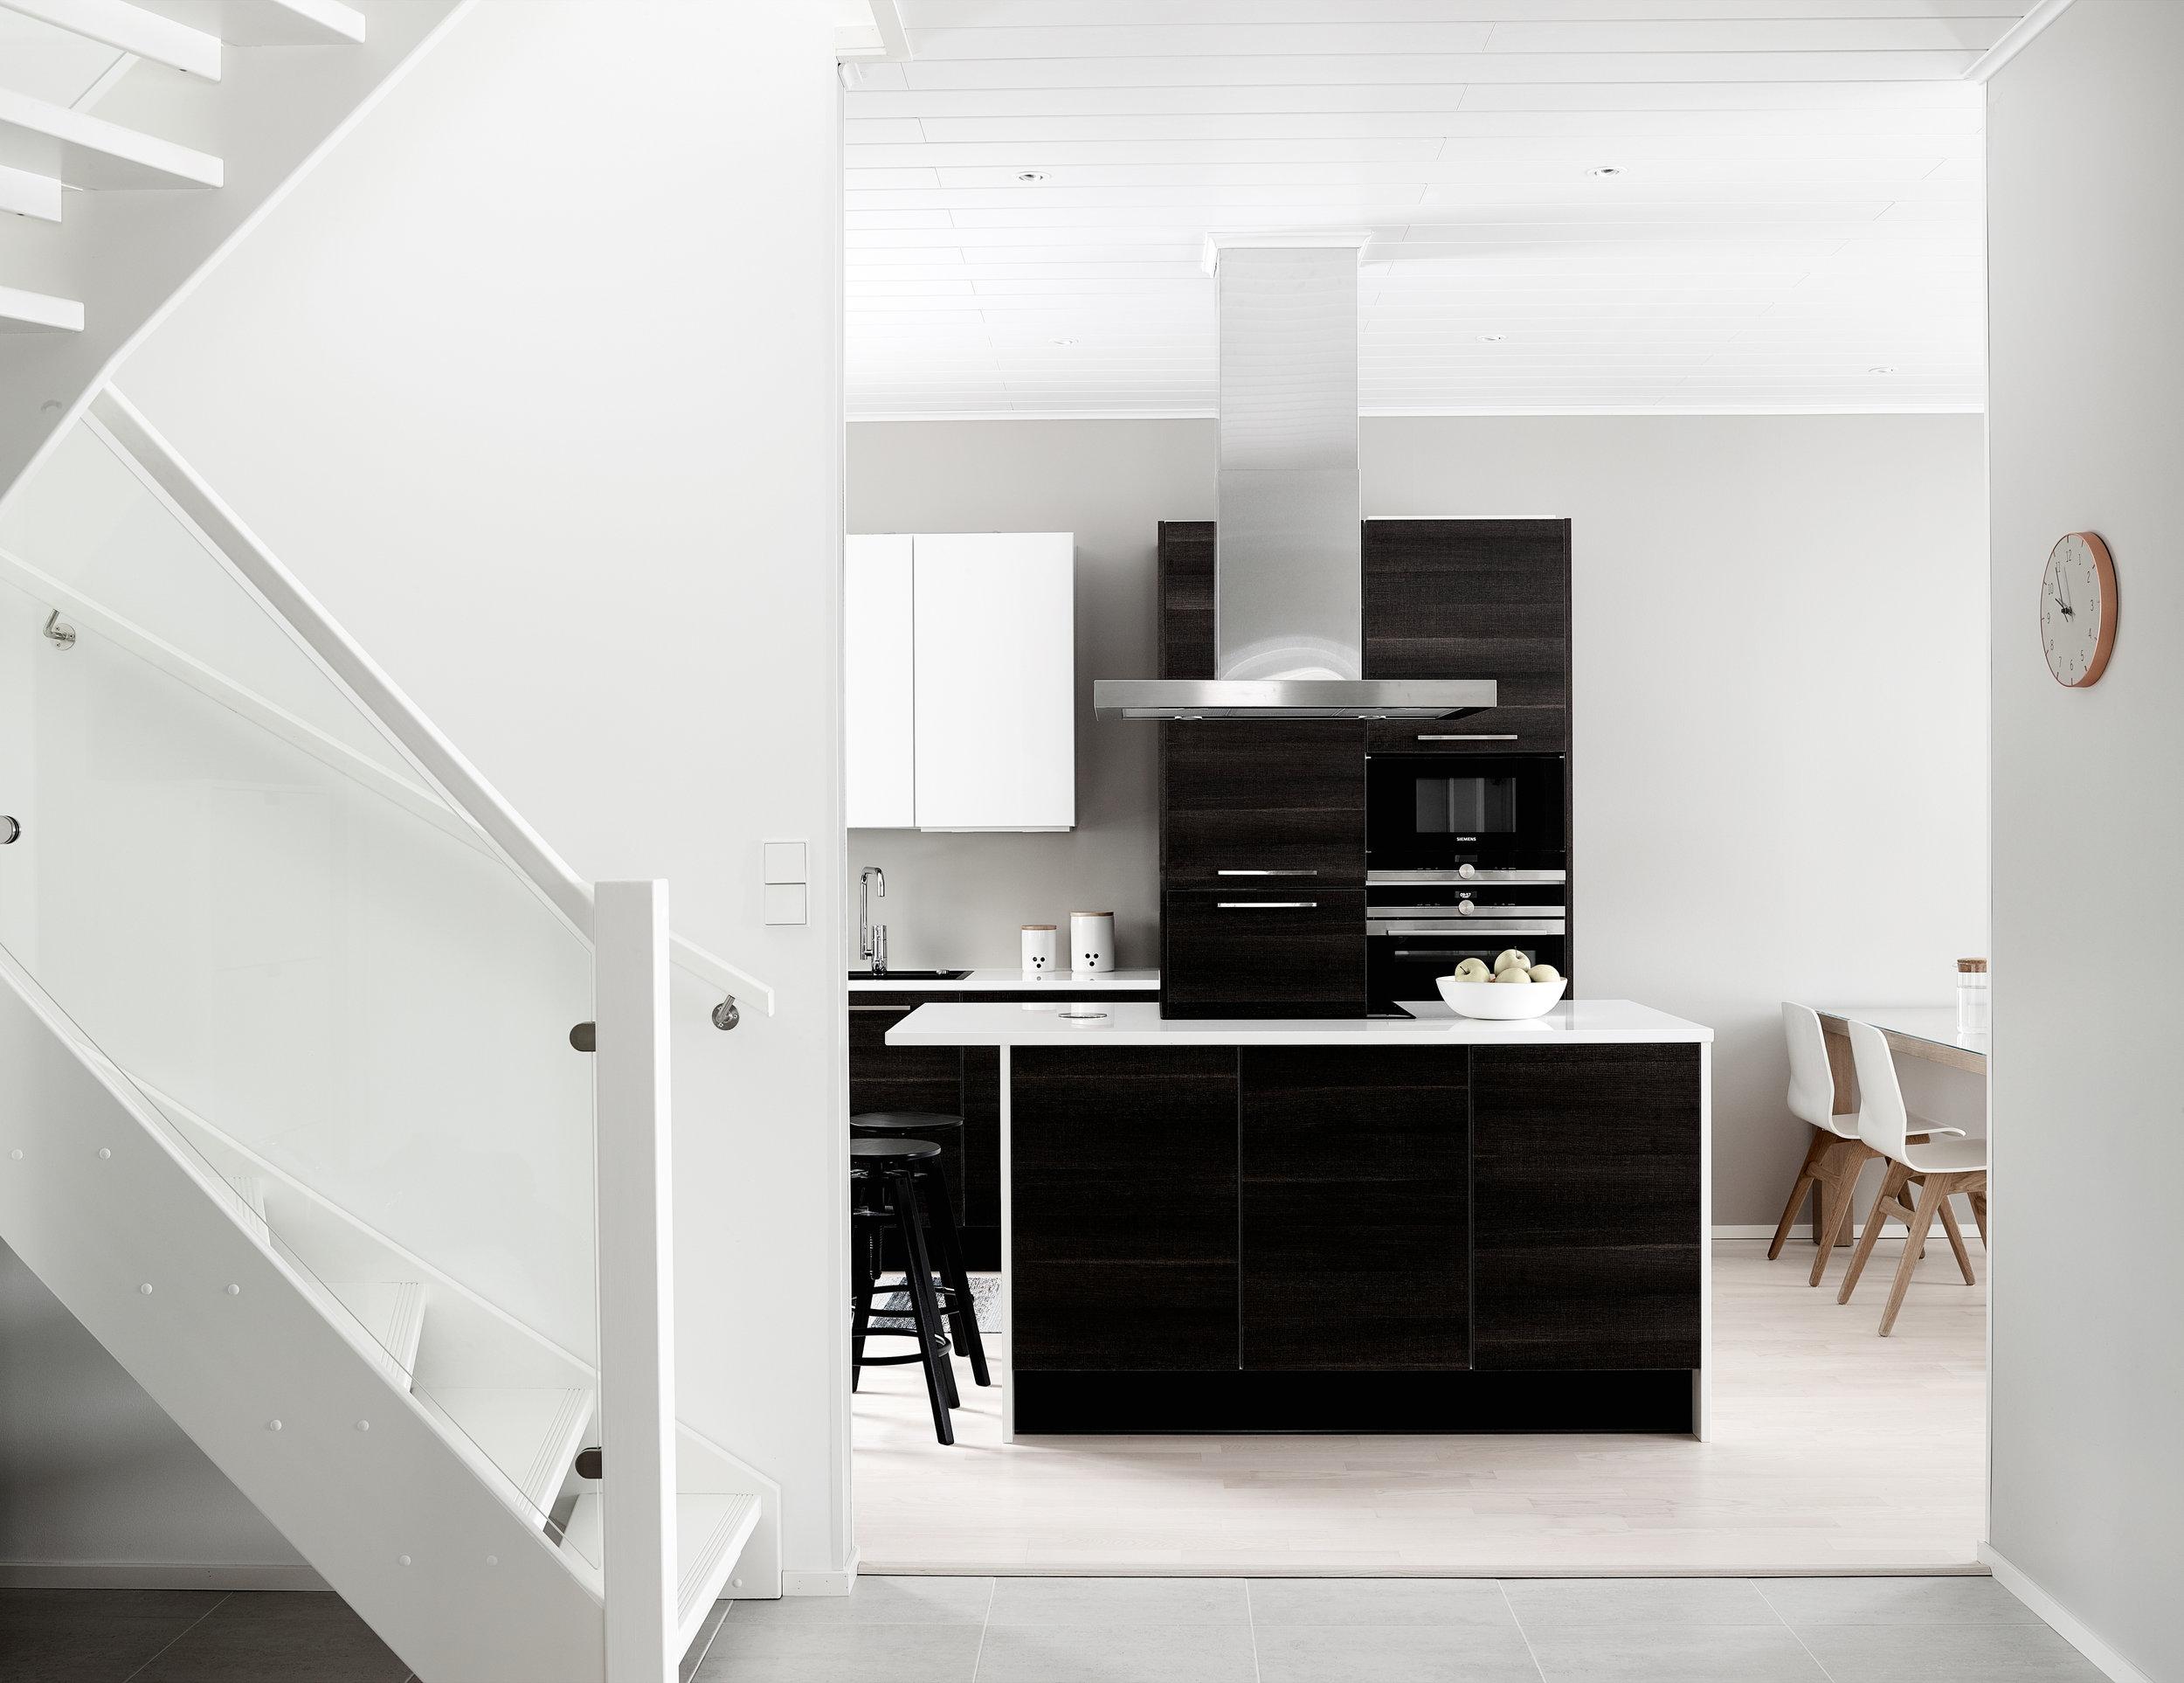 interior-anna-koponen-photo-krista-keltanen-03.jpg